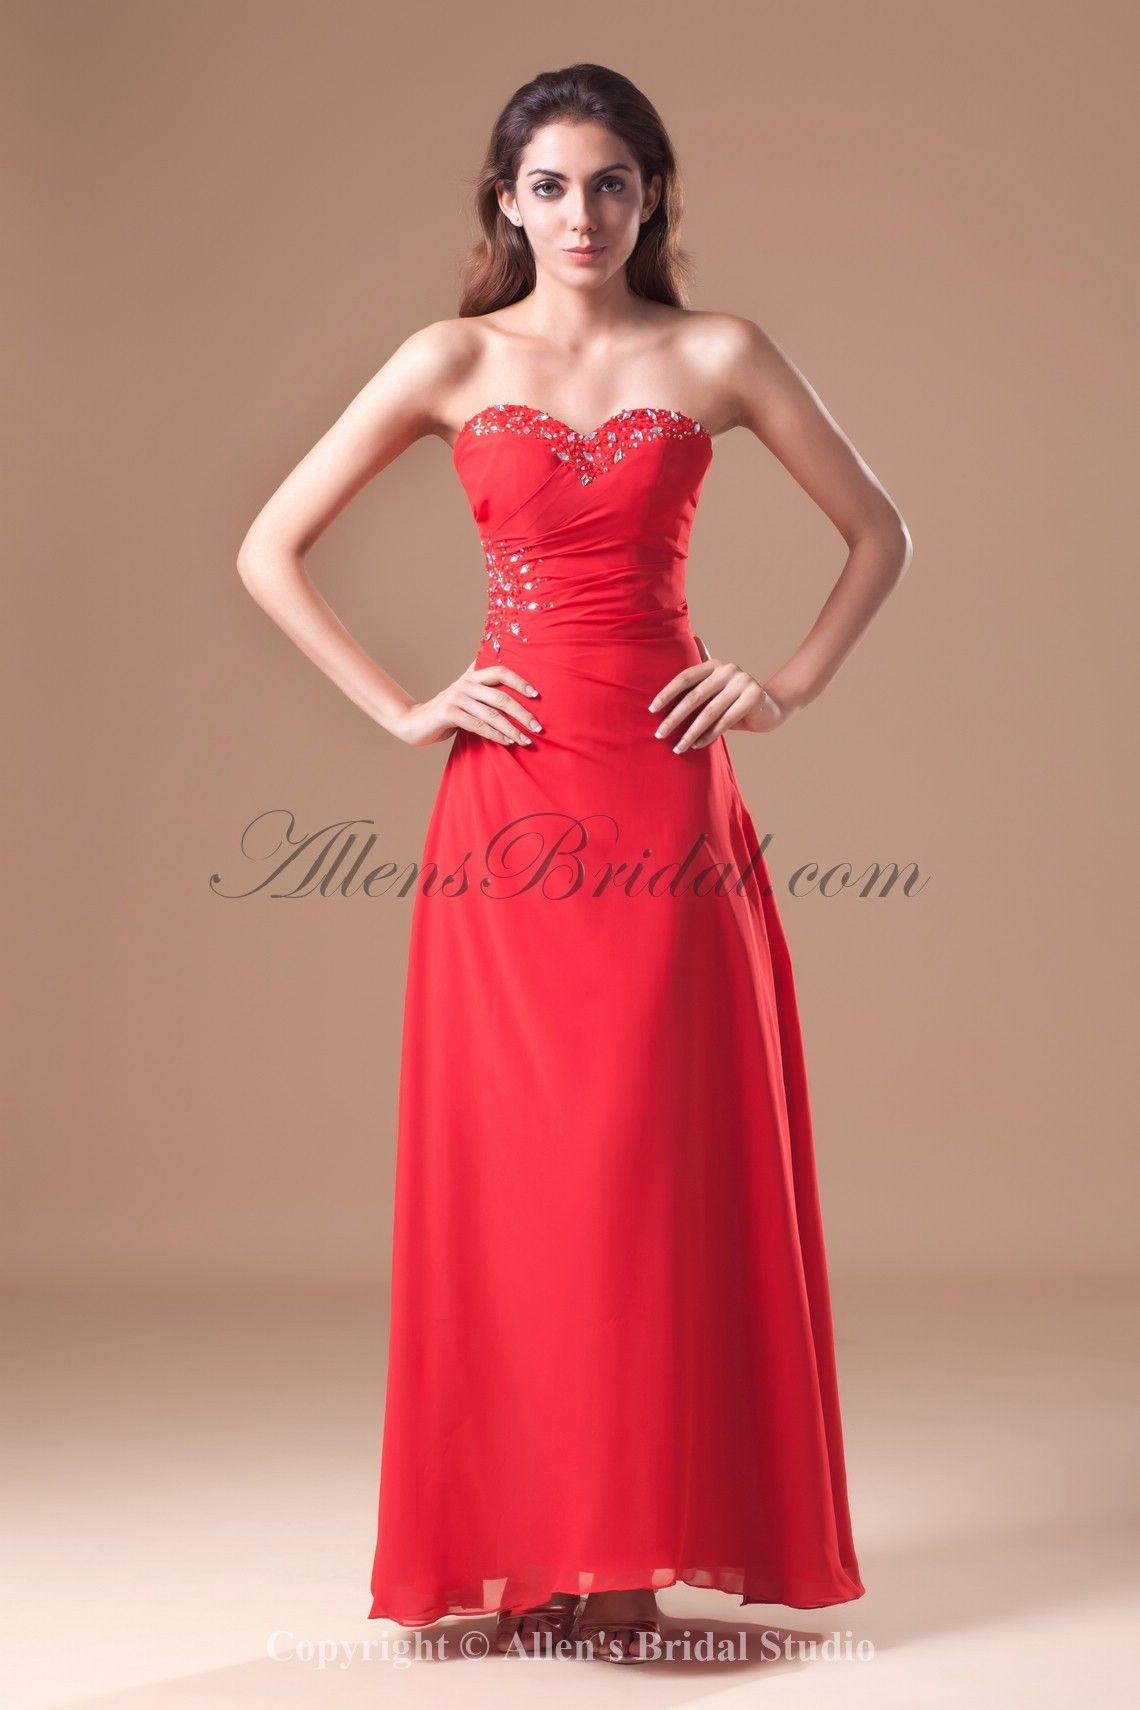 Chiffon sweetheart floor length aline crystals prom dress on sale